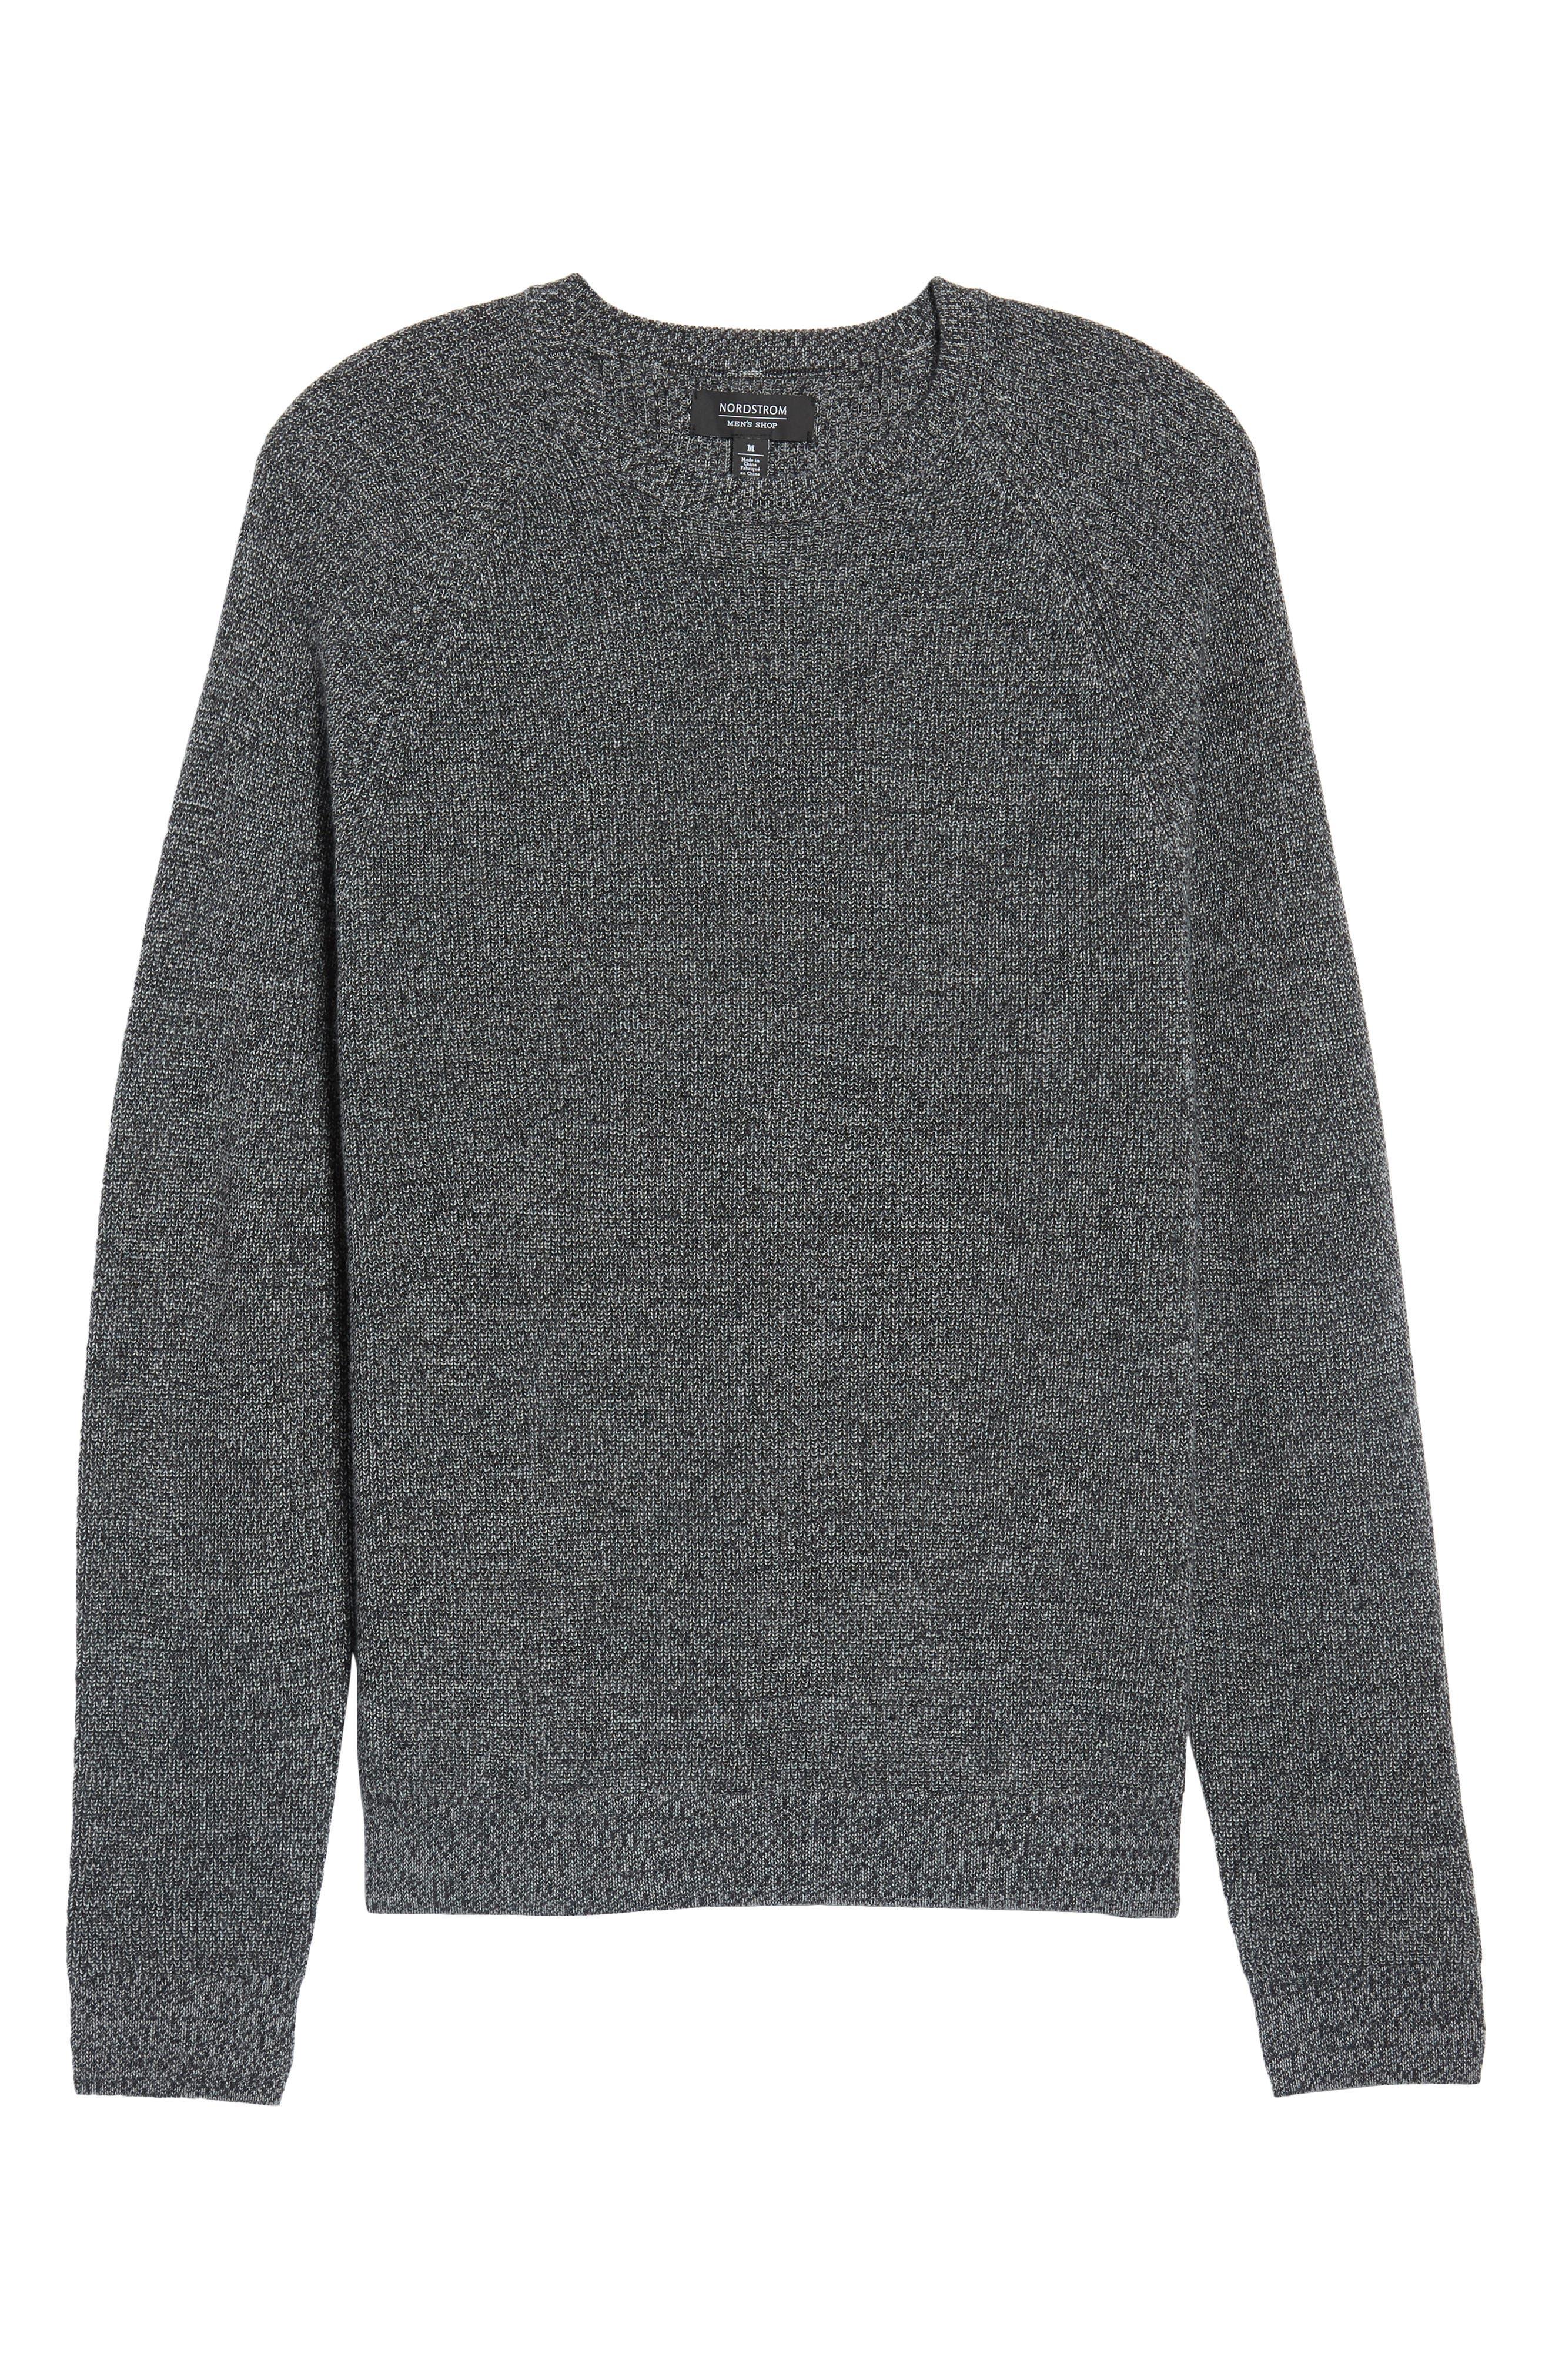 Textured Merino Wool Blend Sweater,                         Main,                         color, Black Caviar Melange